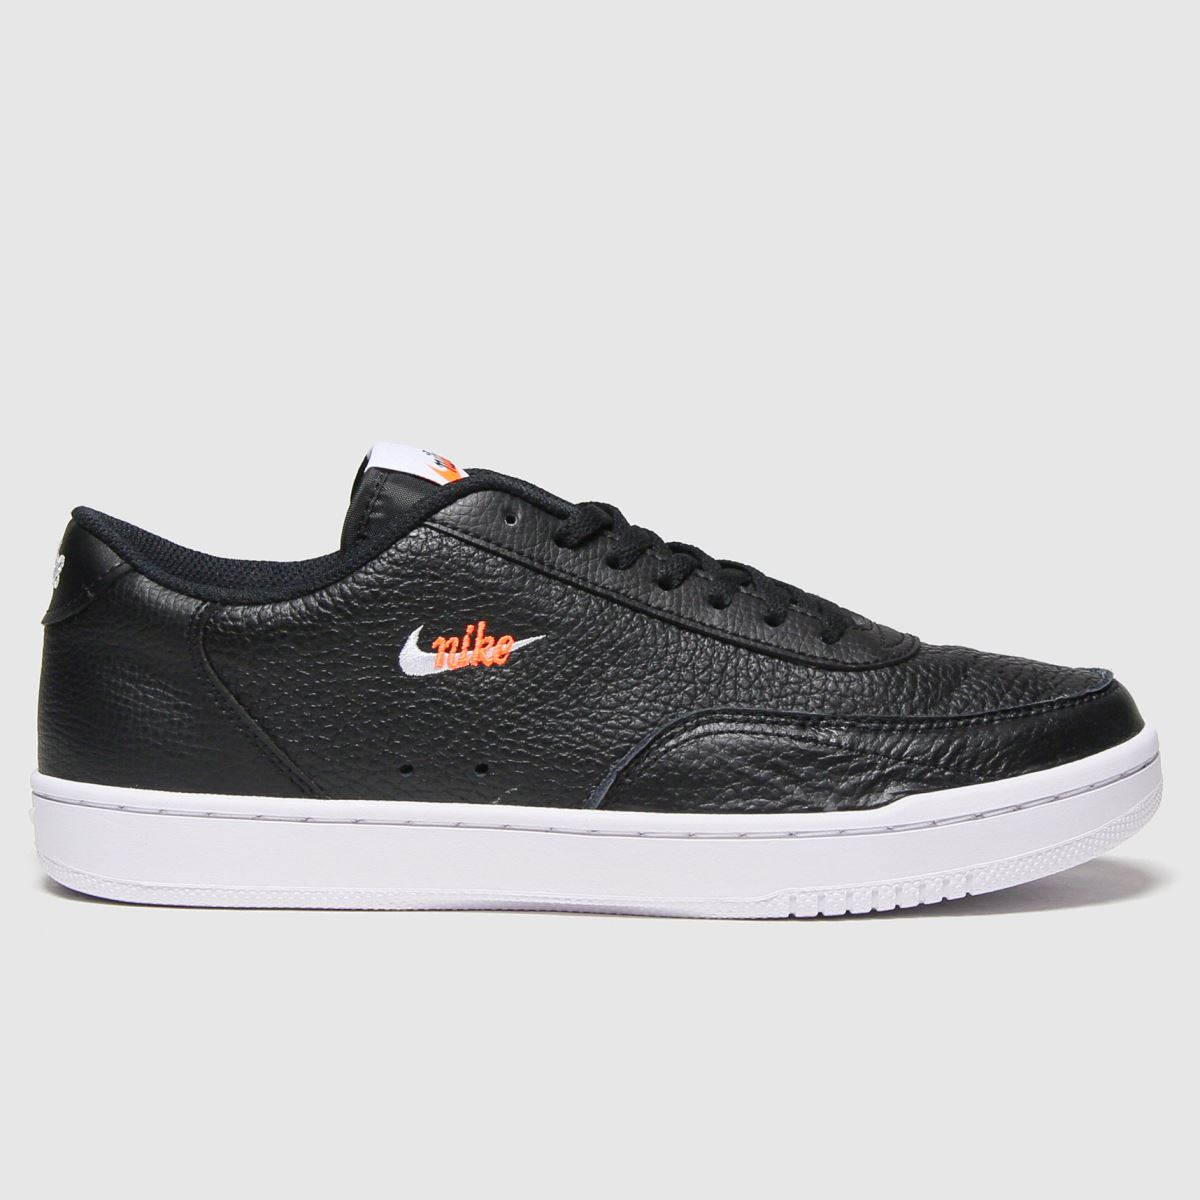 Nike Black Court Vintage Premium Trainers